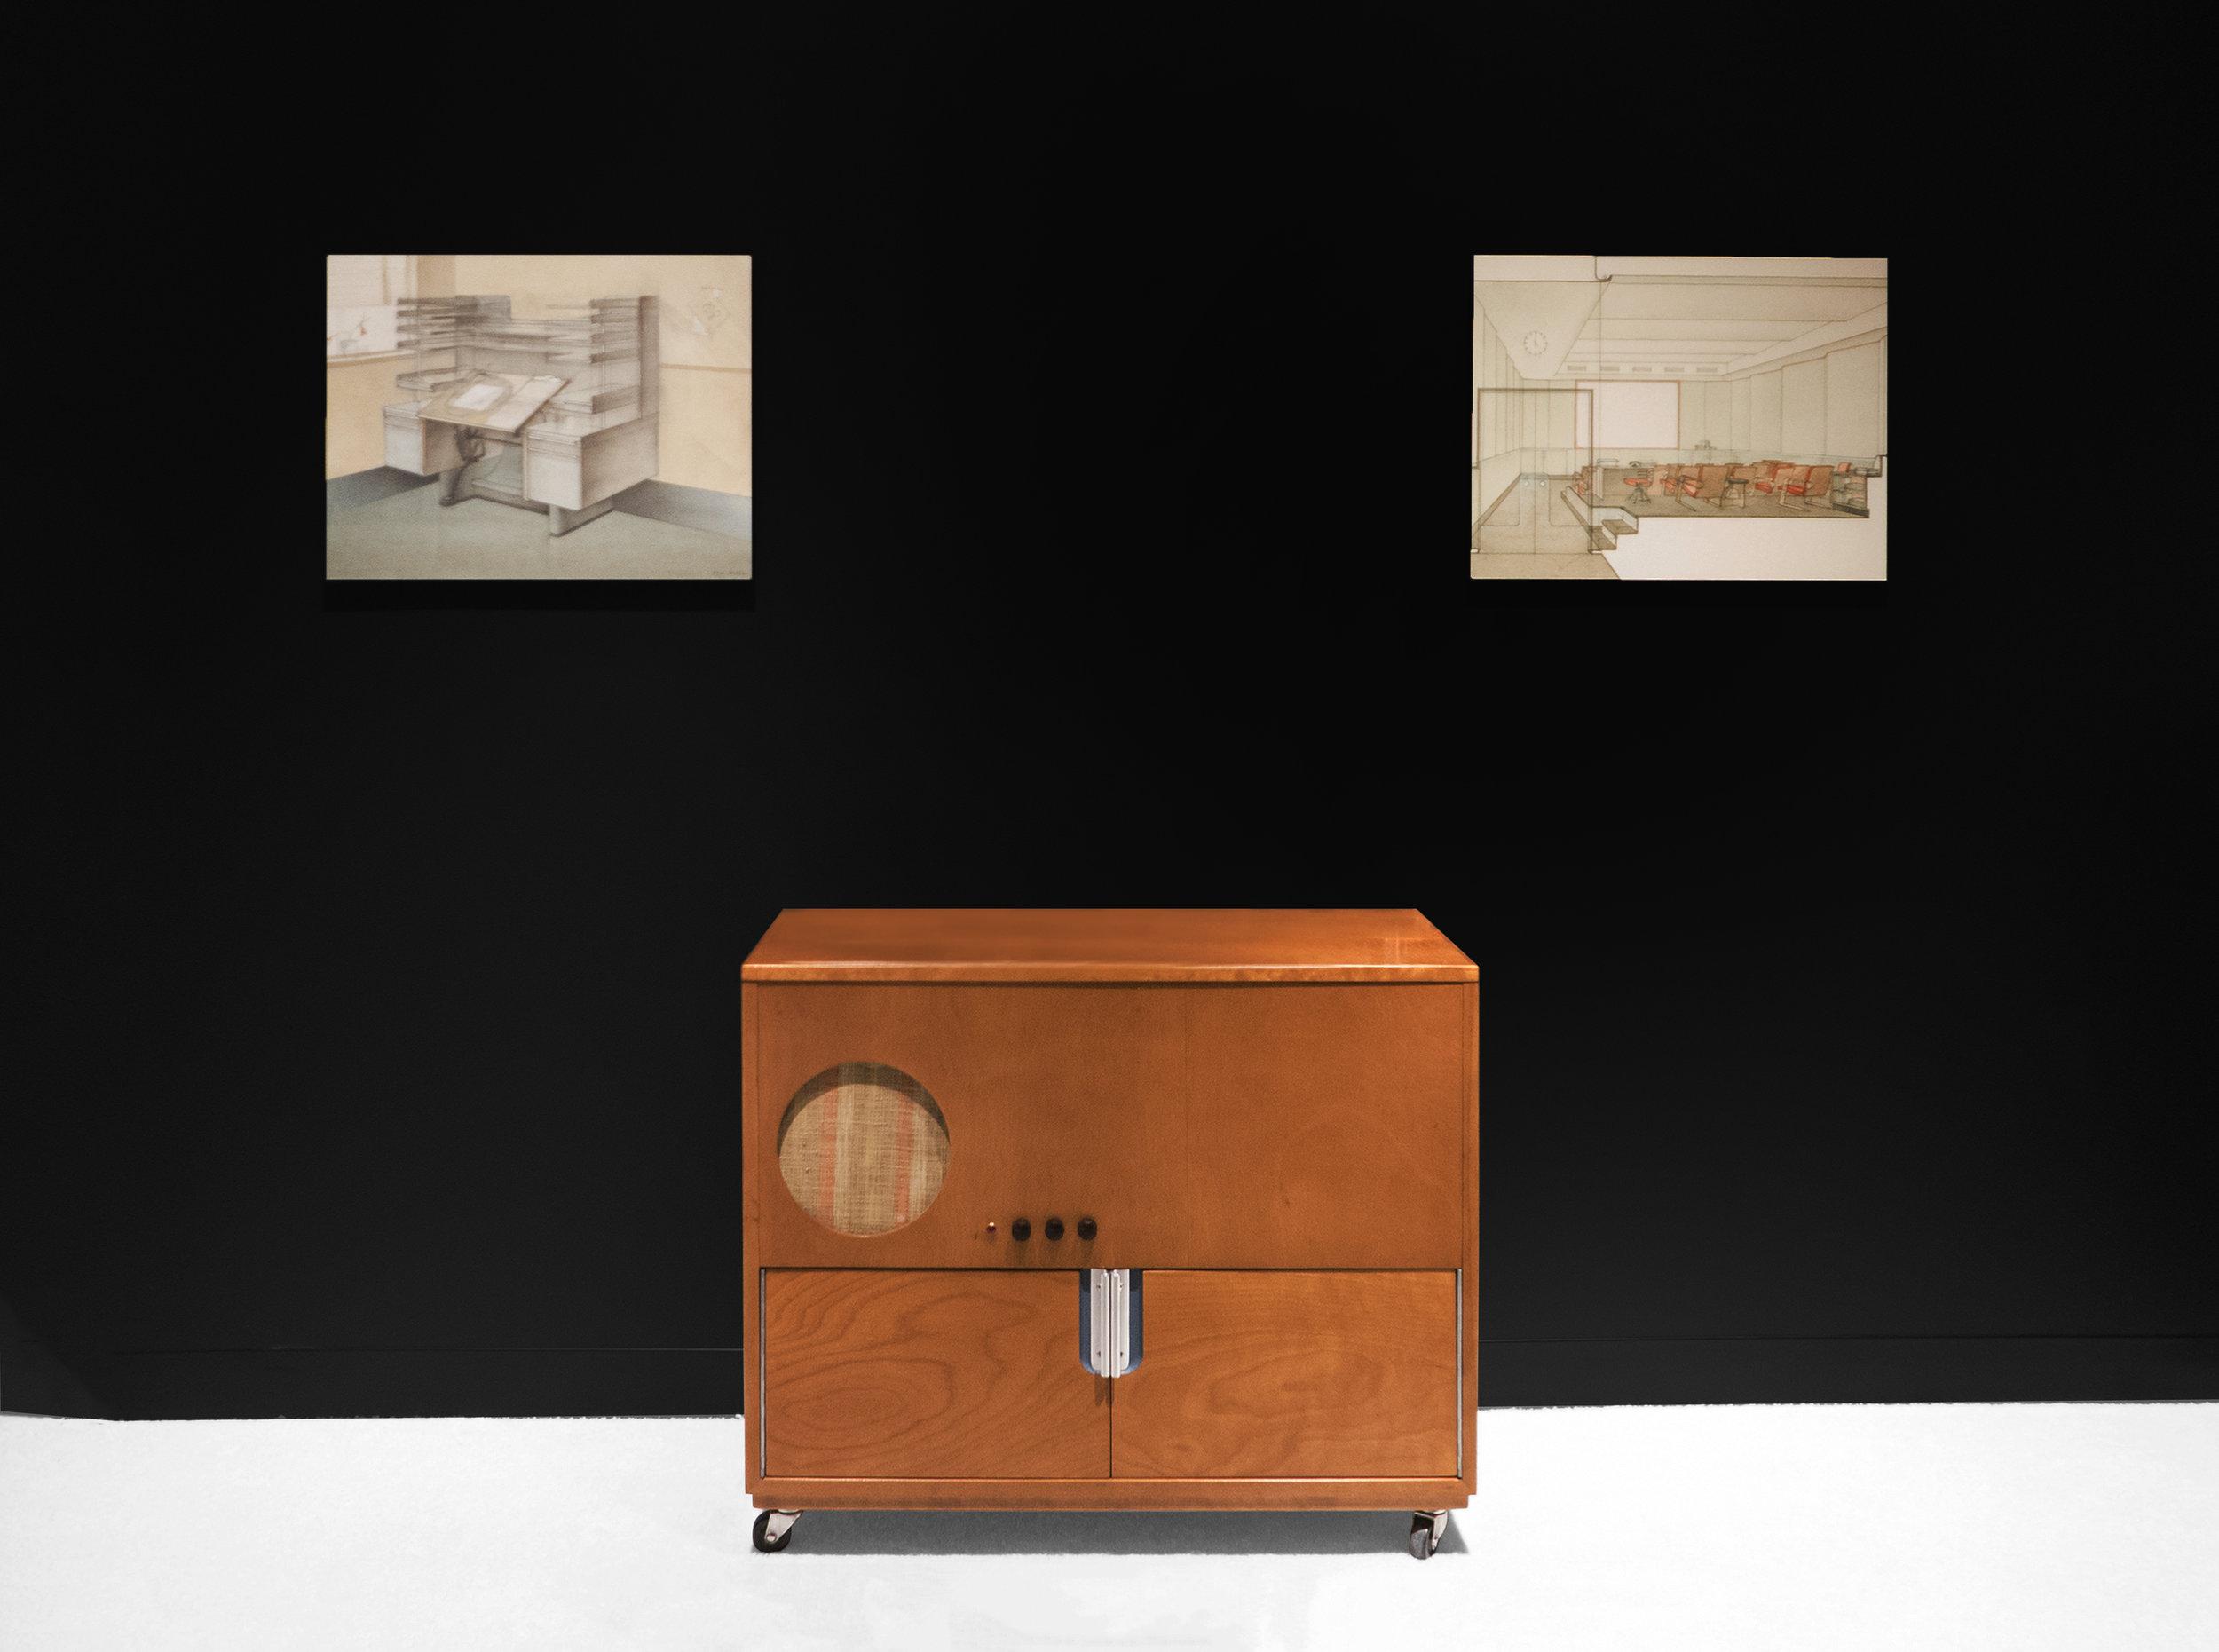 Design Miami 2018_Peter Blake Gallery_Installation View_7.jpg